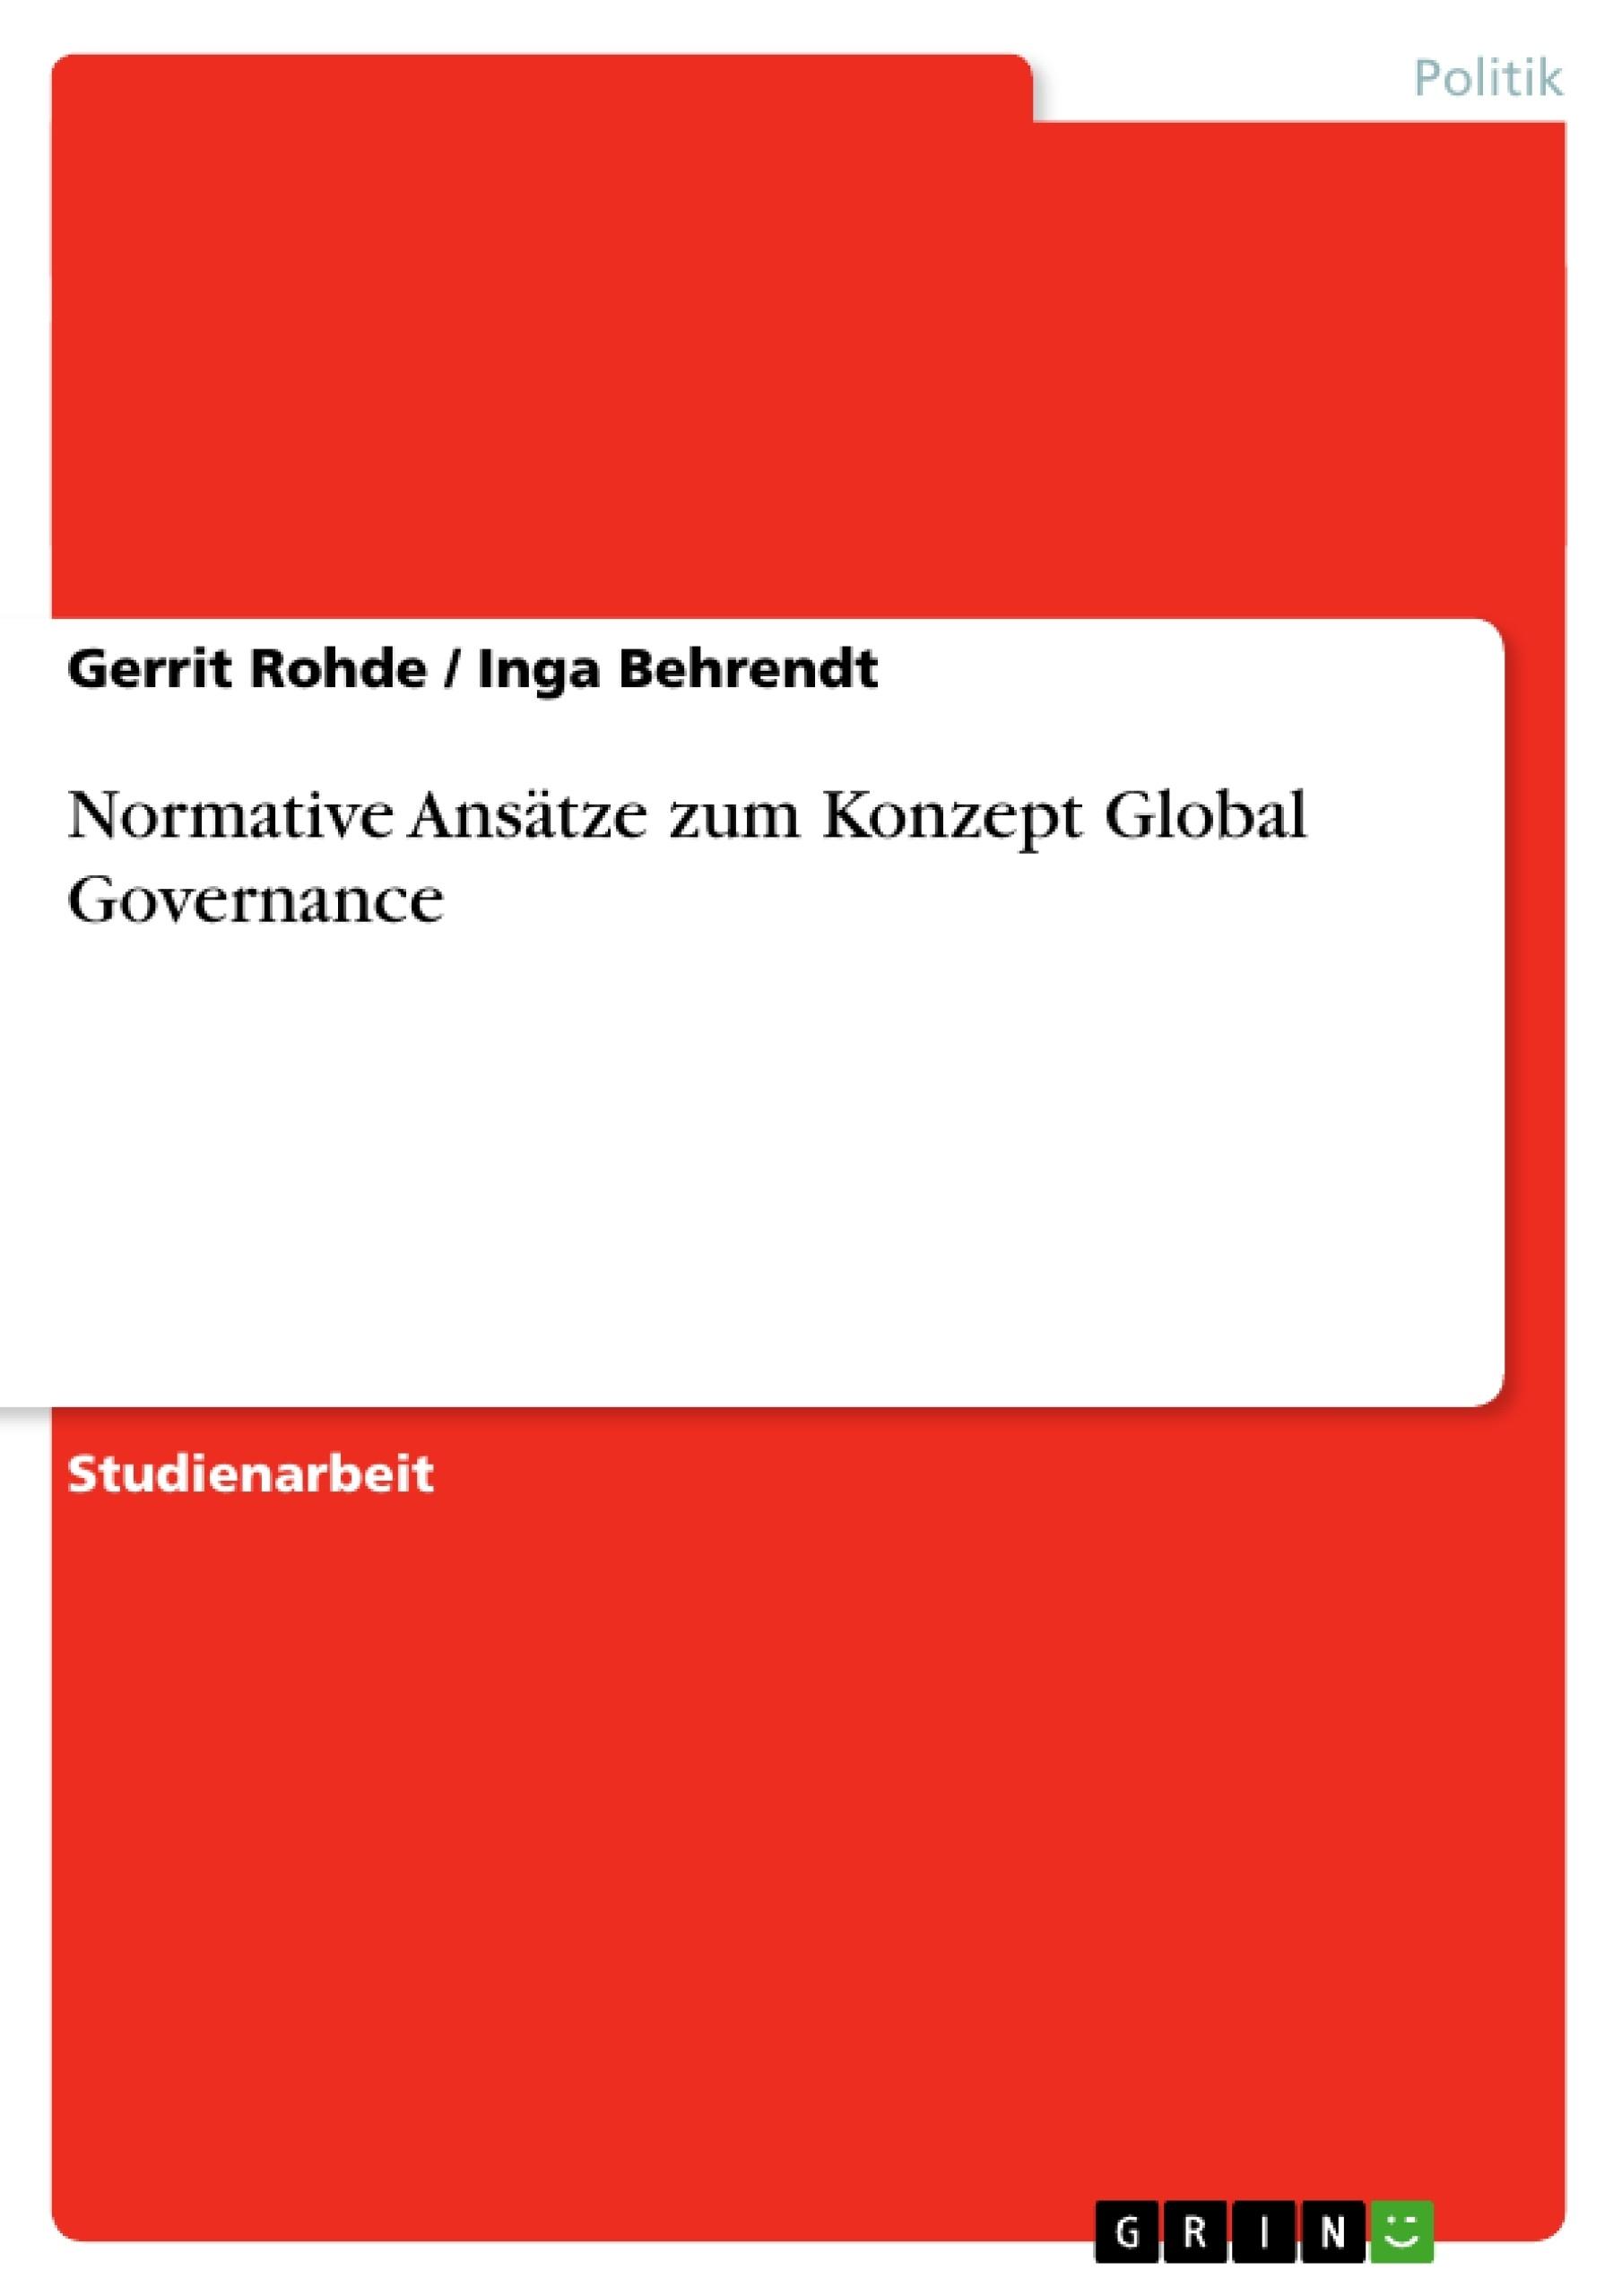 Titel: Normative Ansätze zum Konzept Global Governance